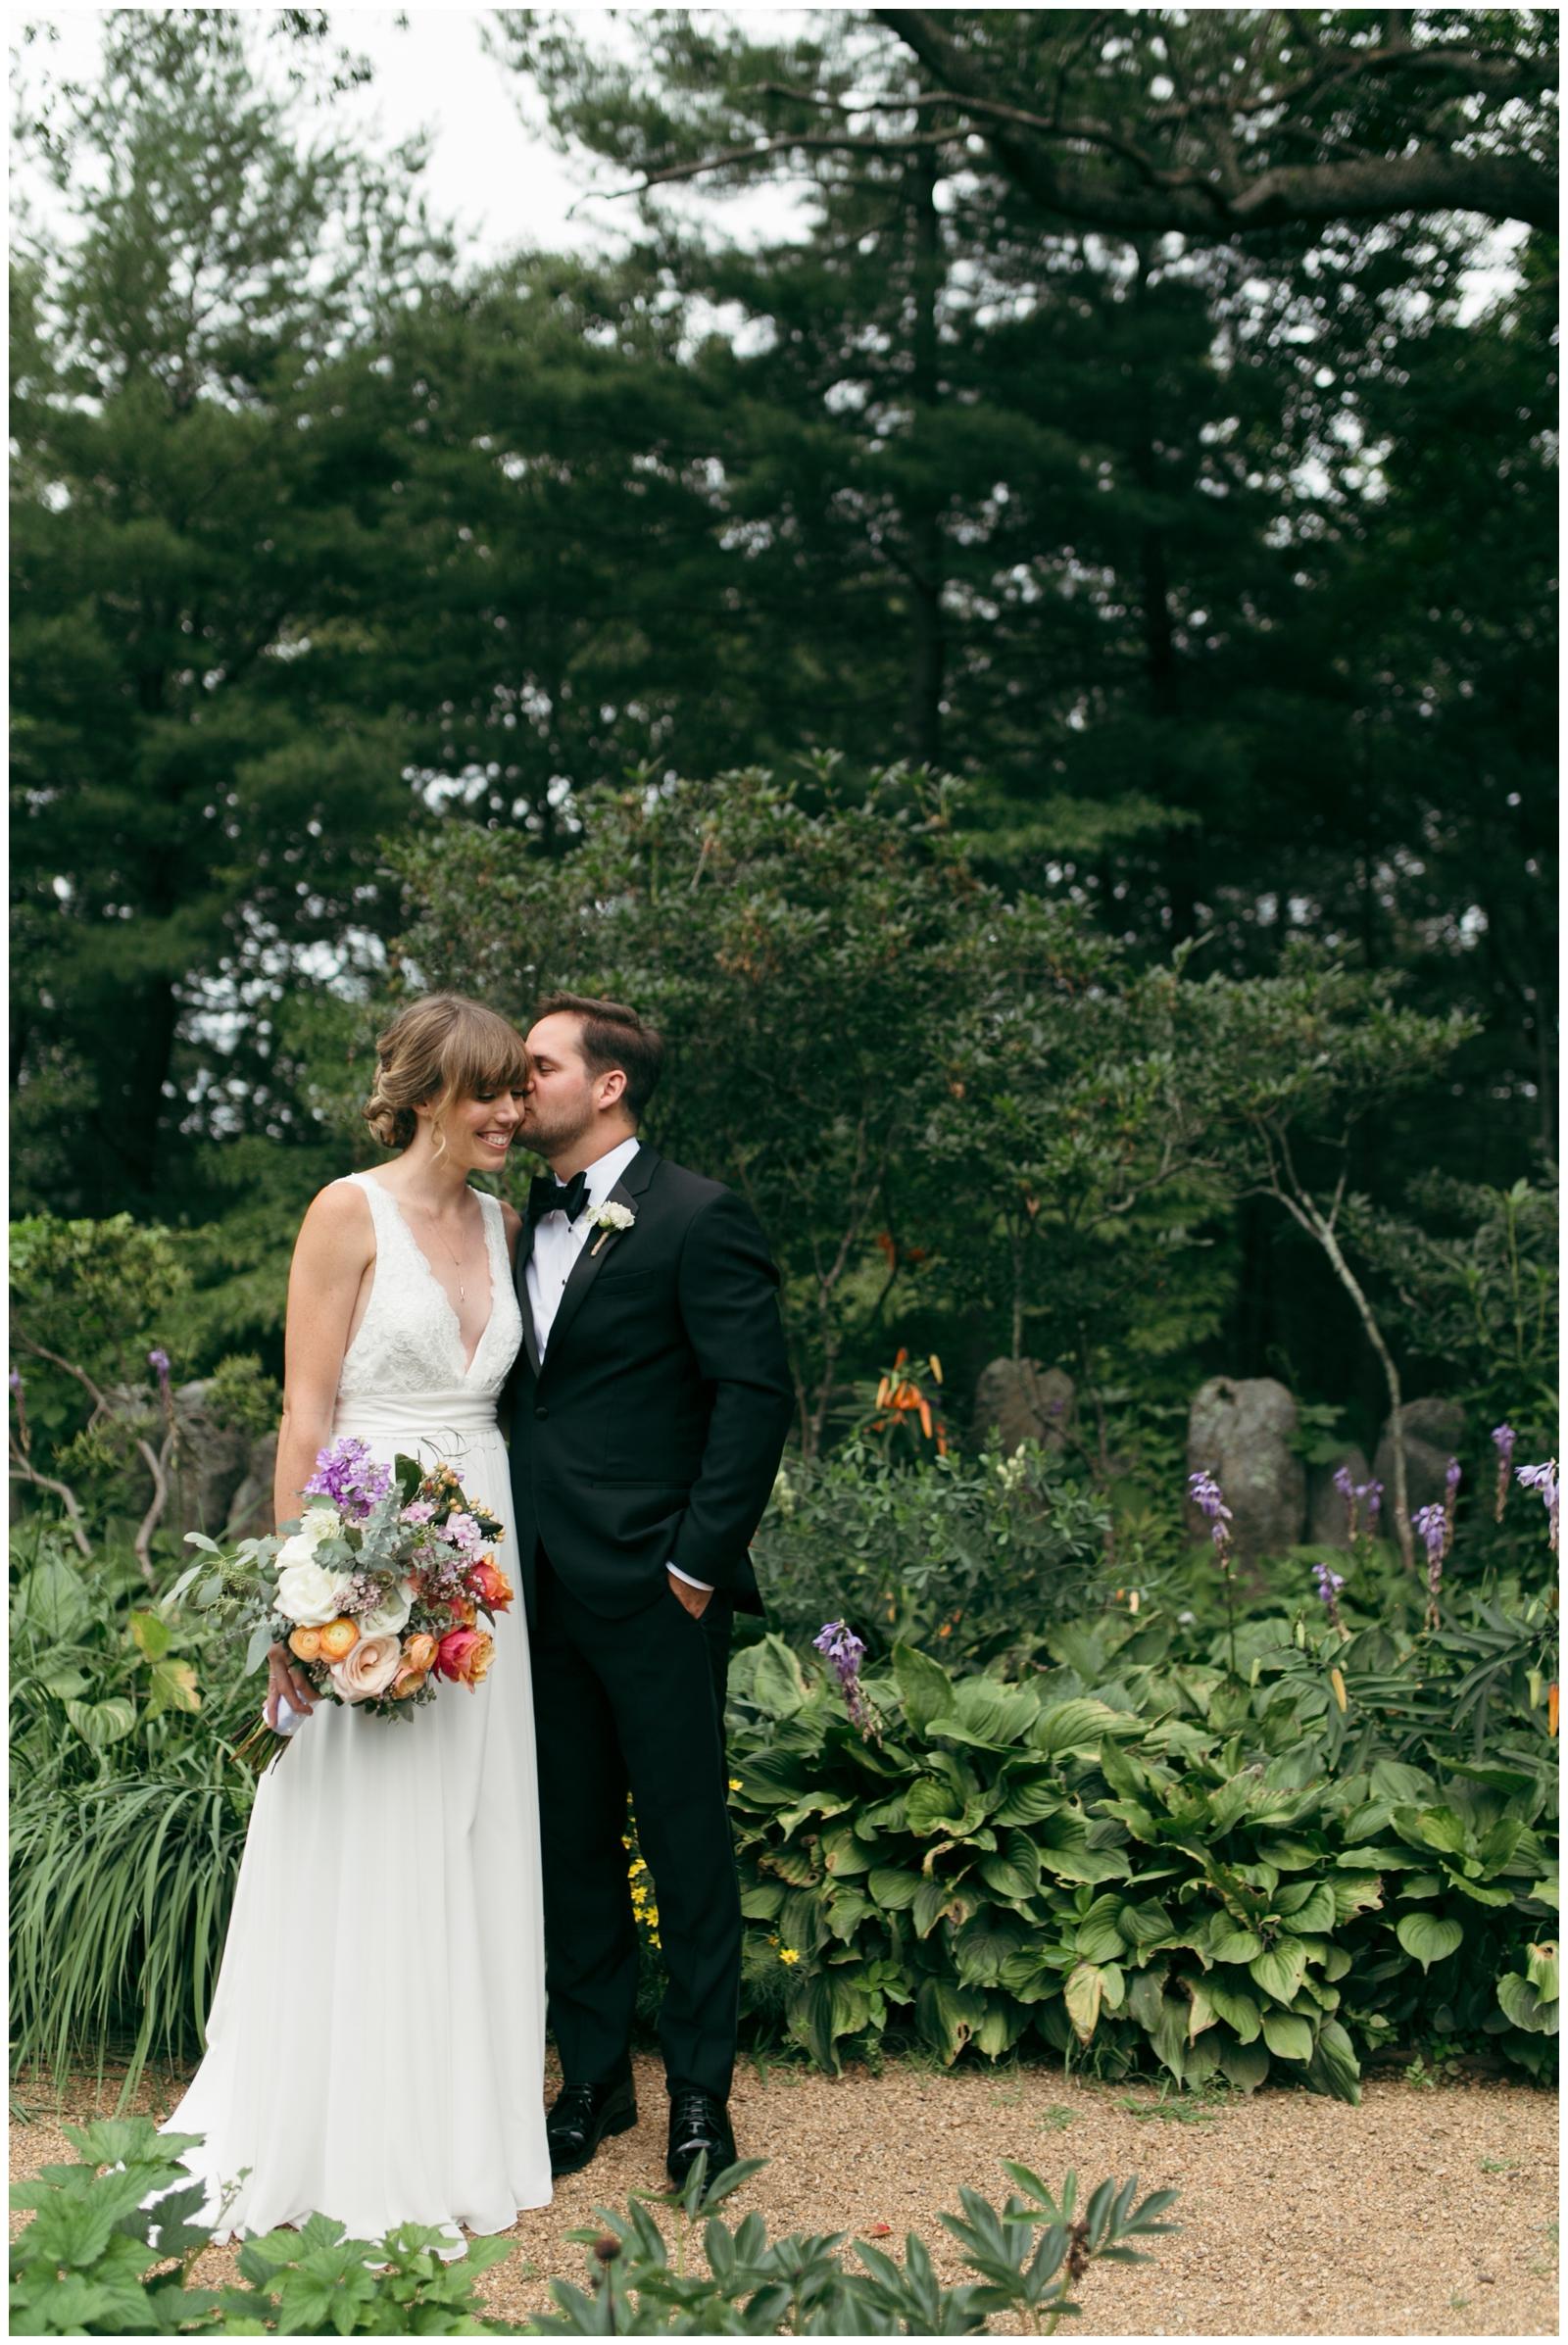 Moraine-Farm-wedding-Bailey-Q-Photo-Massachusetts-wedding-photpgrapher-020.jpg